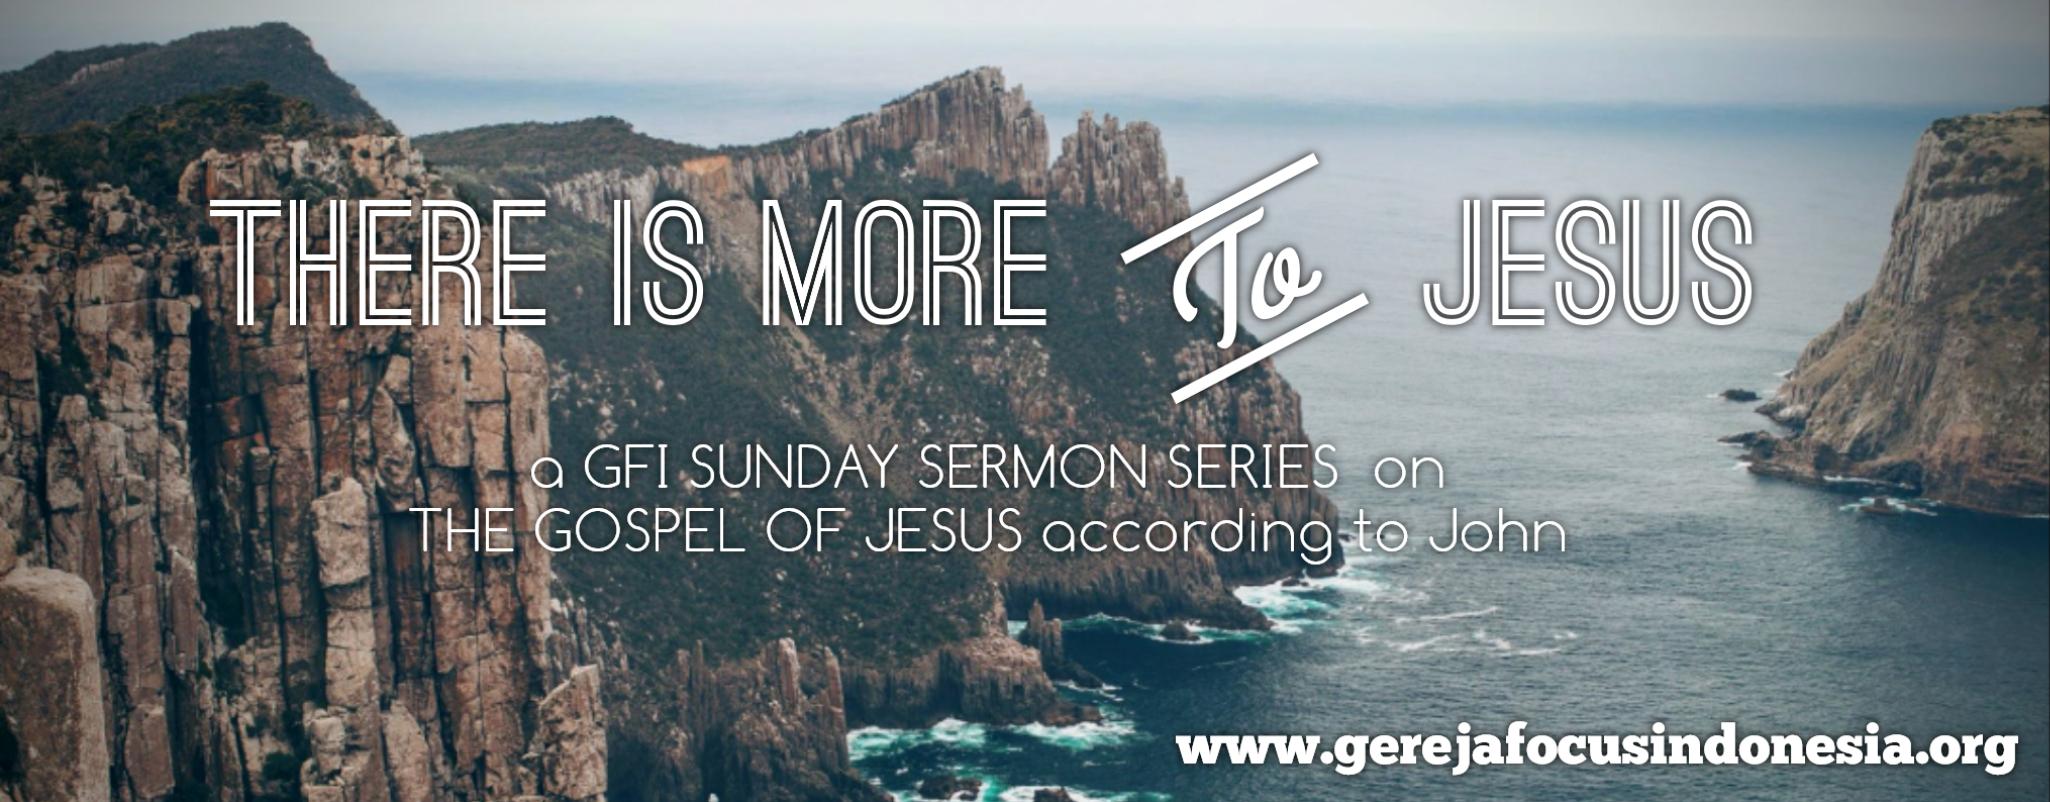 More to Jesus (landscape)